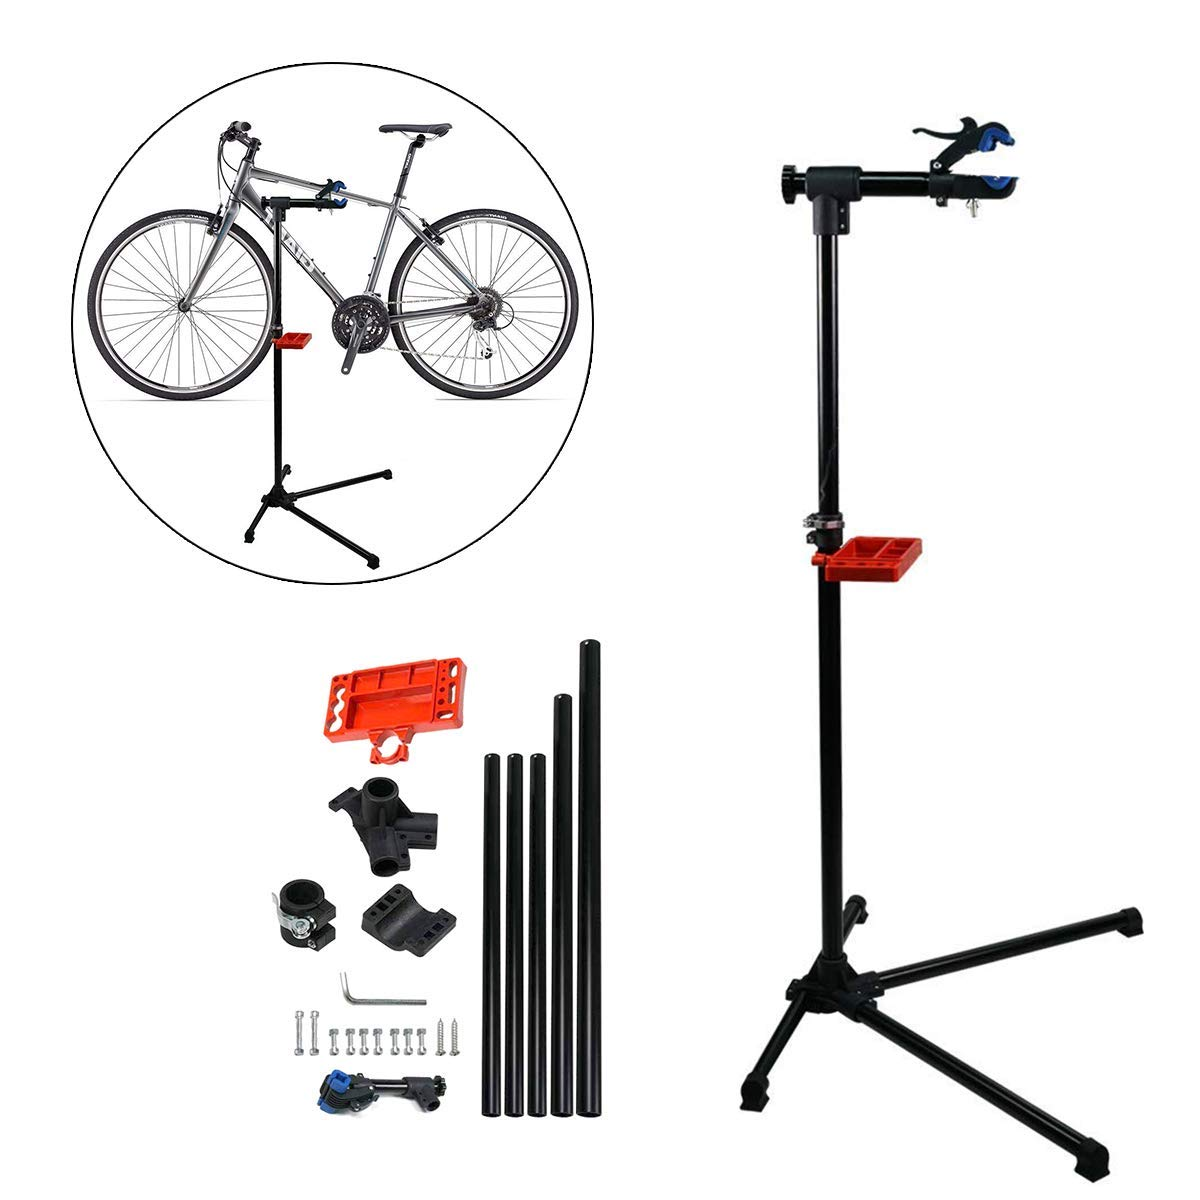 KEENAXIS Adjustable Pro Mechanic Bike Repair Stand Maintenance Rack Workstand W/Tool Tray & Telescopic Arm Extensible Bicycle Repair Stand by KEENAXIS